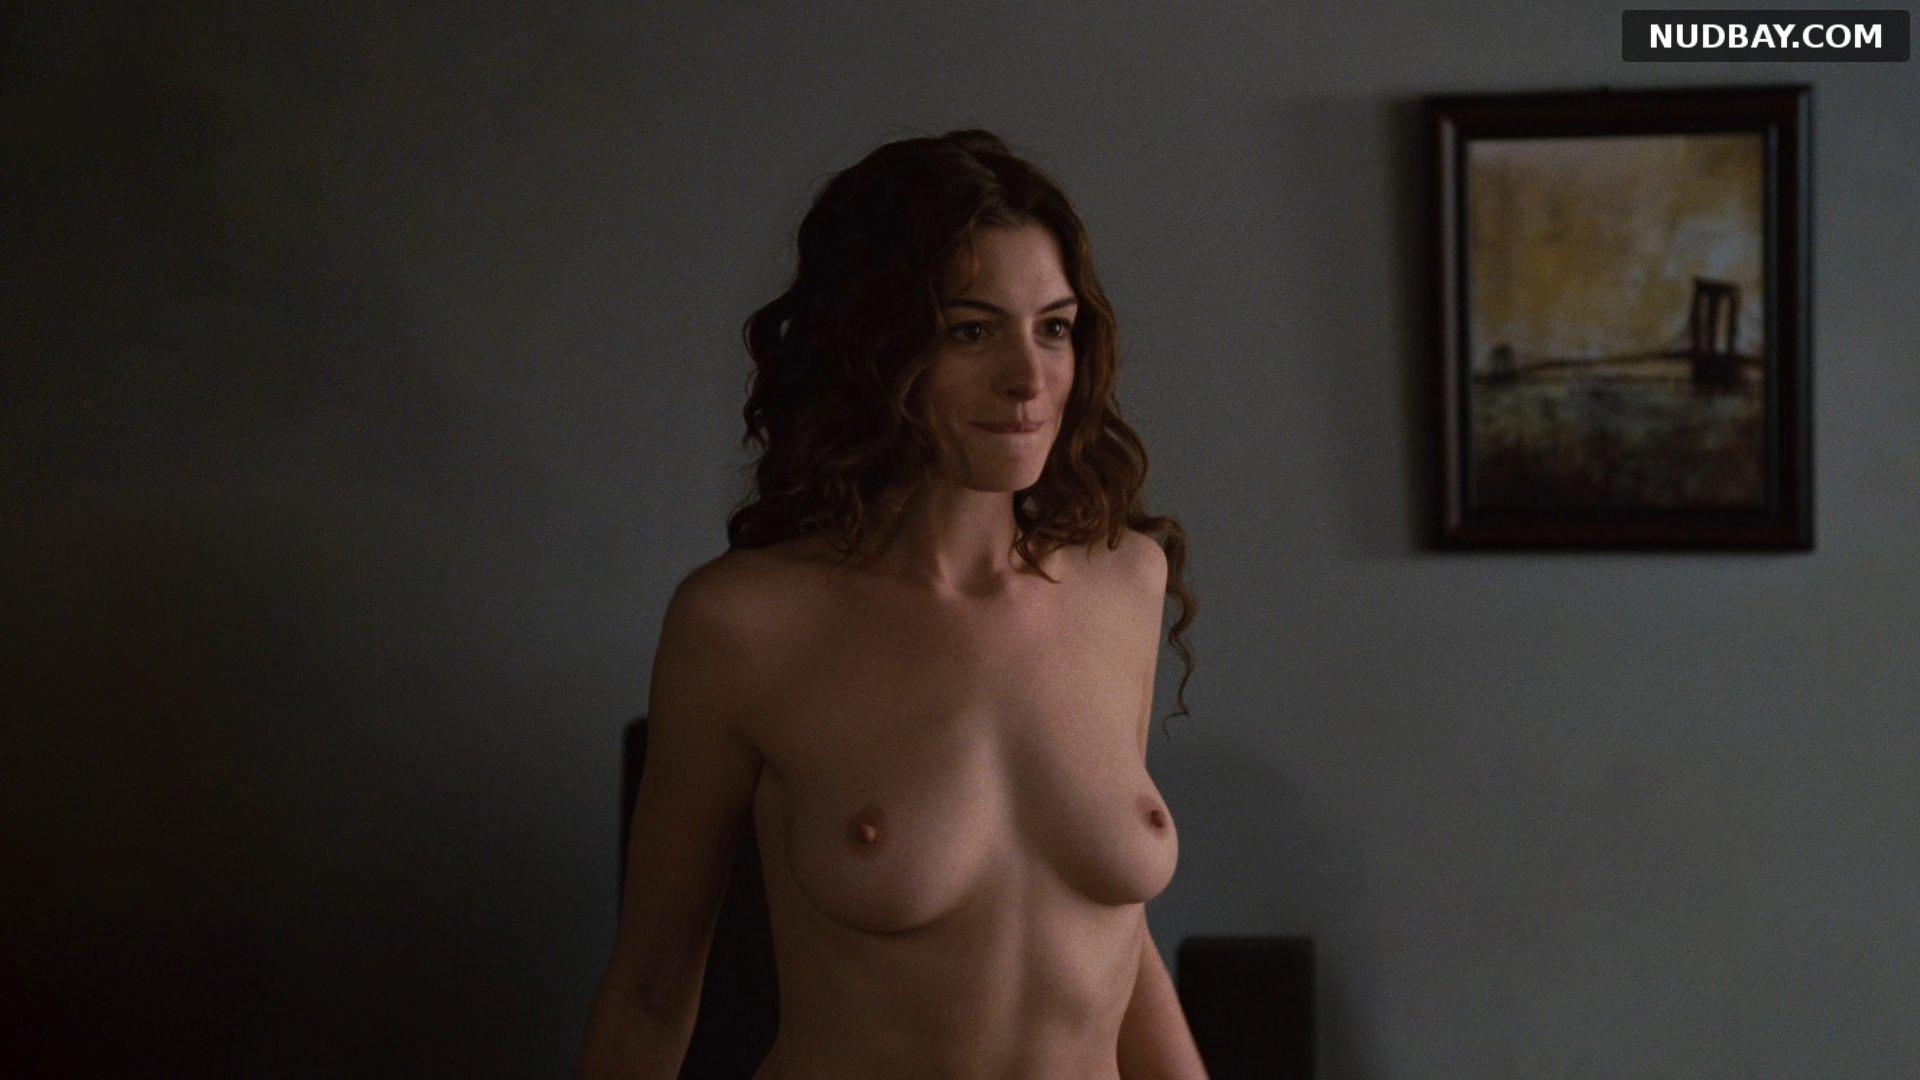 Anne Hathaway nude nudbay.com